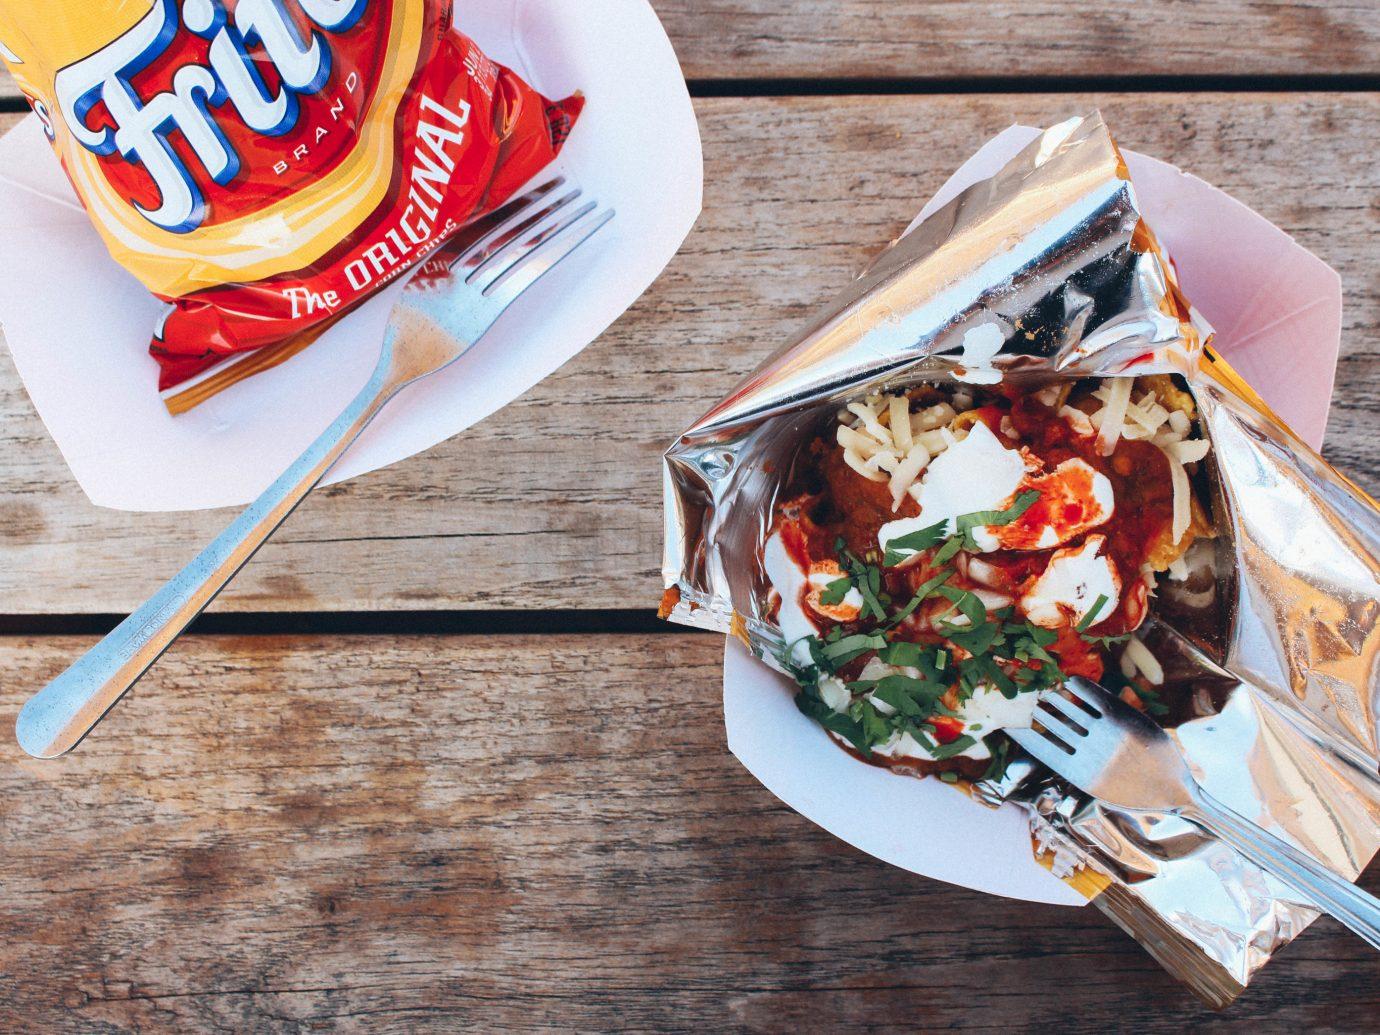 Arts + Culture Food + Drink Hotels Weekend Getaways table food dish dessert meal